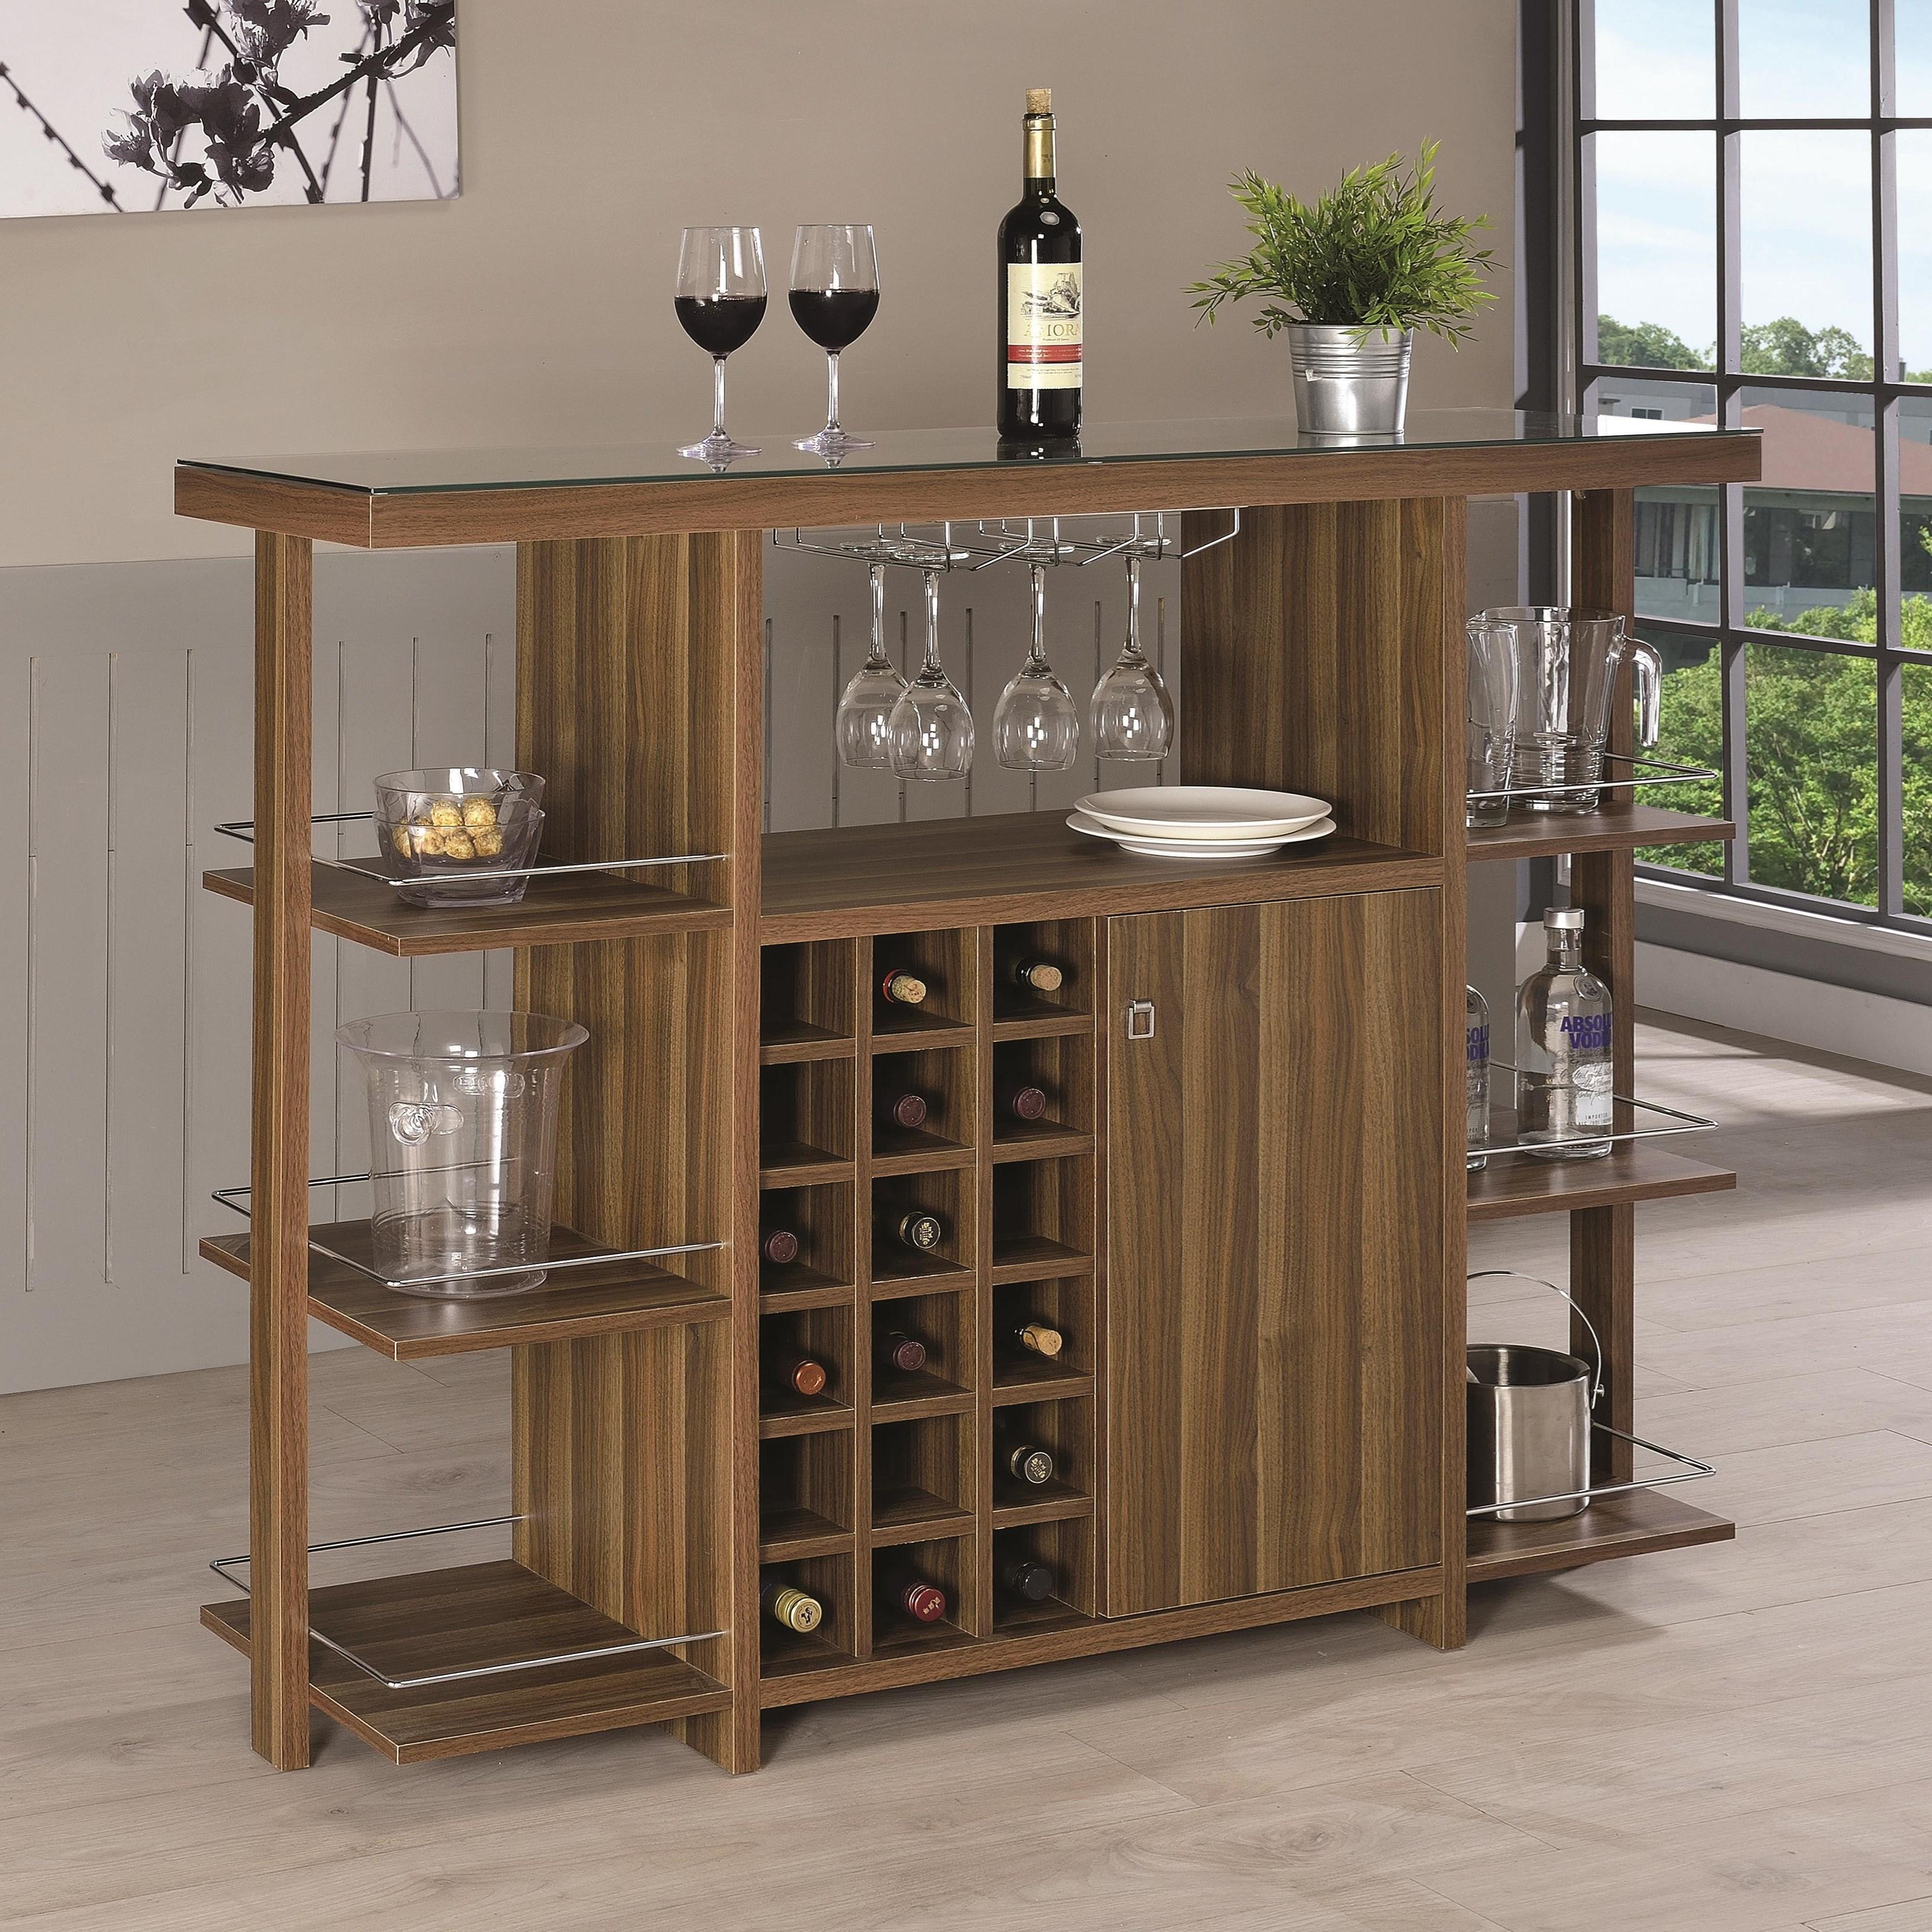 Bar Units and Bar Tables Bar Unit by Coaster at Lapeer Furniture & Mattress Center